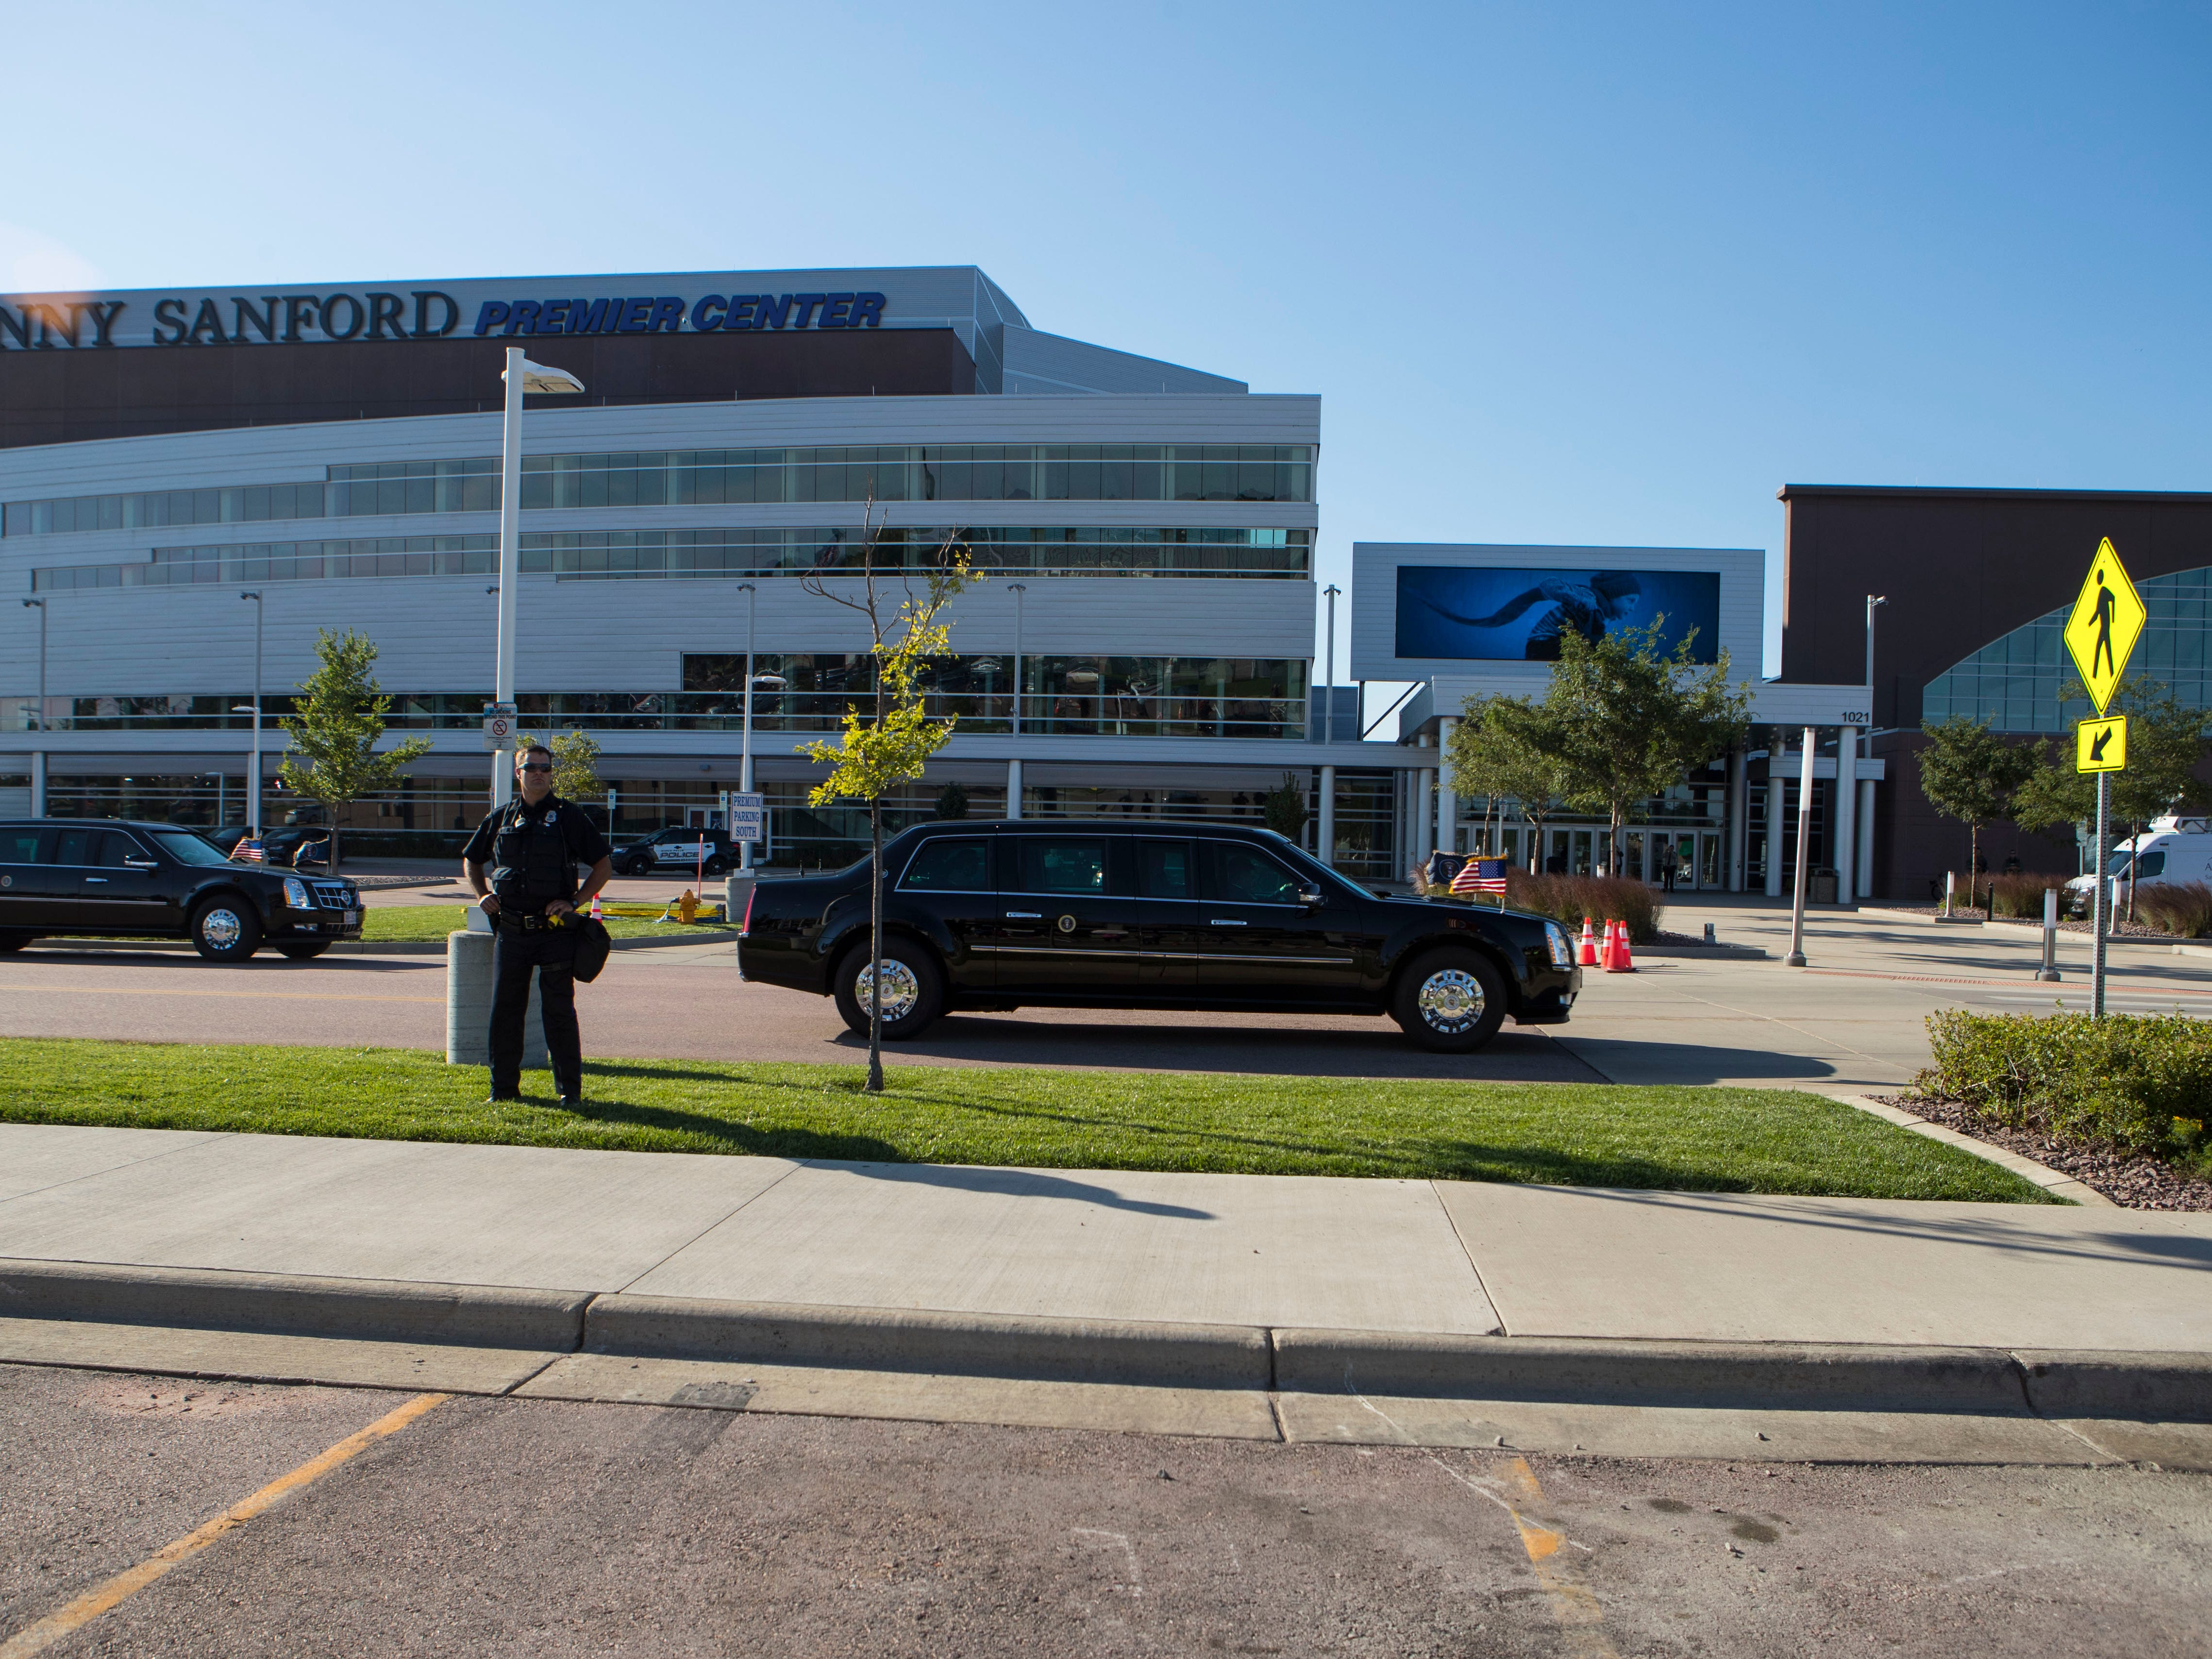 President Donald Trump's motorcade leaves the Denny Sanford Premier Center where he is attending  a closed-door fundraiser for Republican gubernatorial hopeful Kristi Noem on Friday, Sept. 7, 2018 in Sioux Falls, S.D.